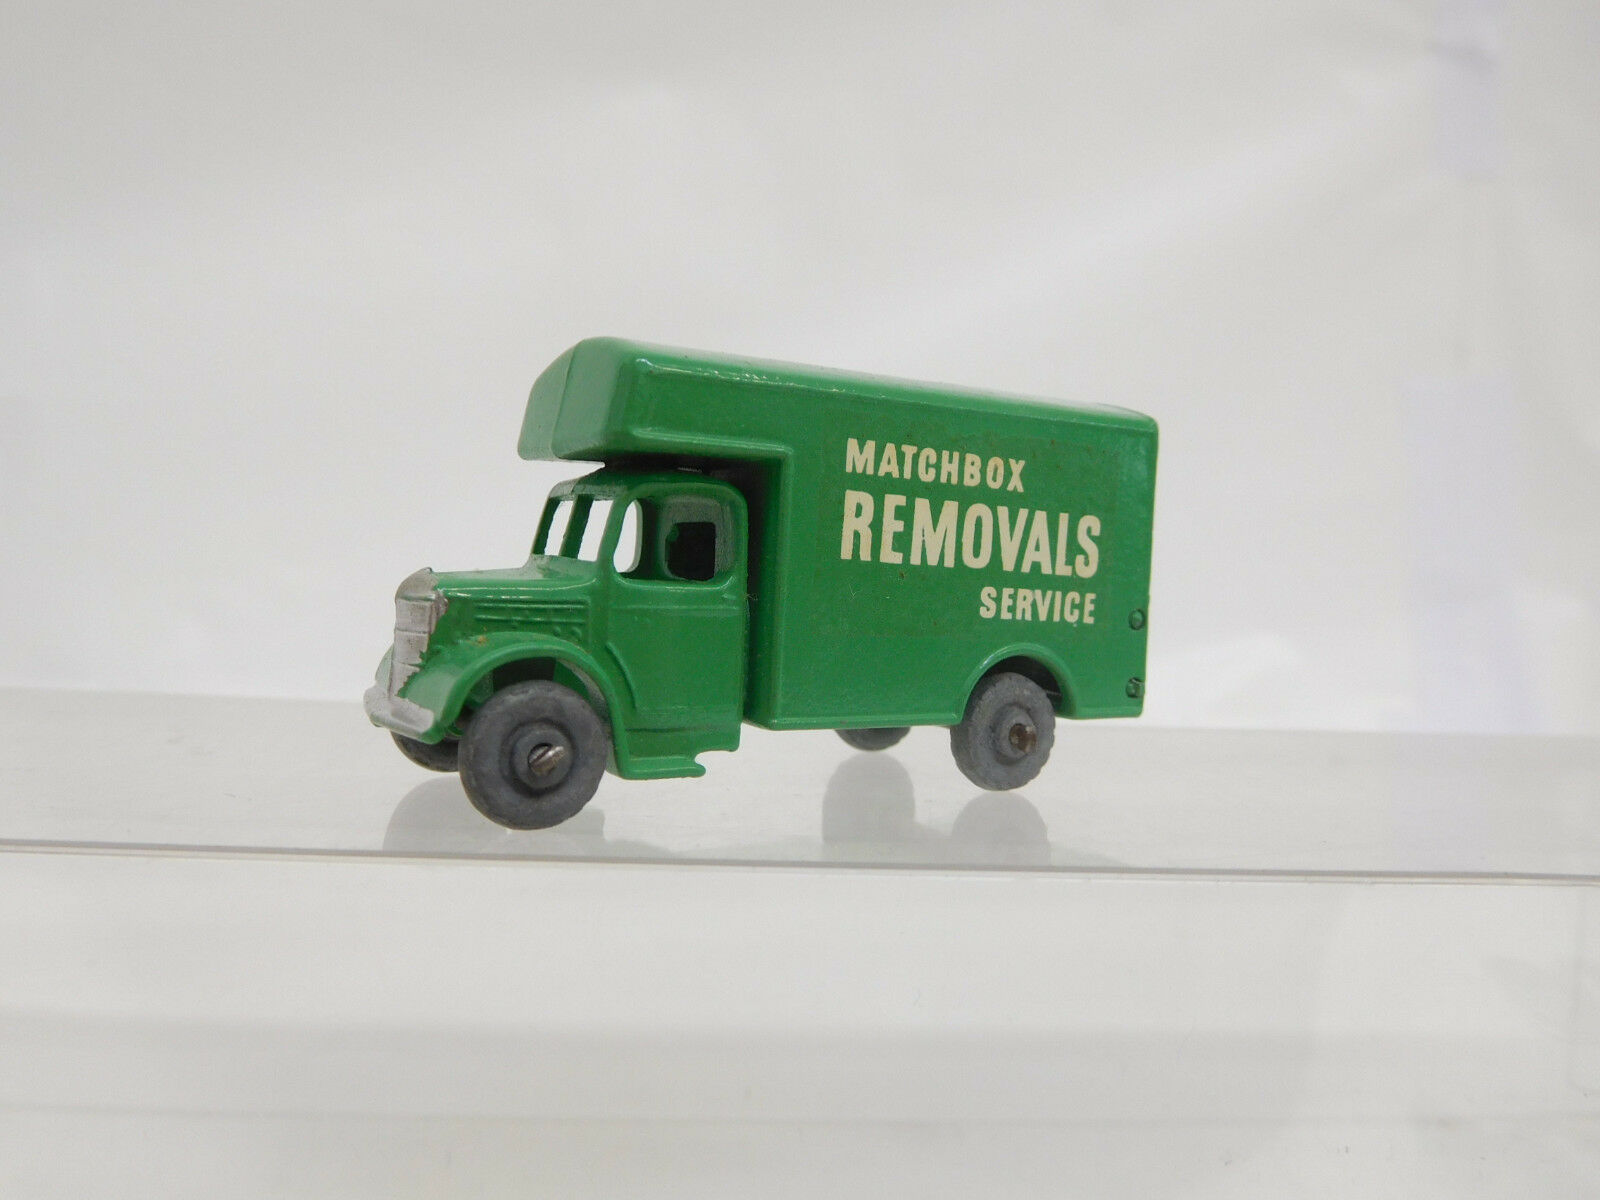 moda Mes-51182 Mes-51182 Mes-51182 Lesney Matchbox removals Service muy buen estado  el mas reciente